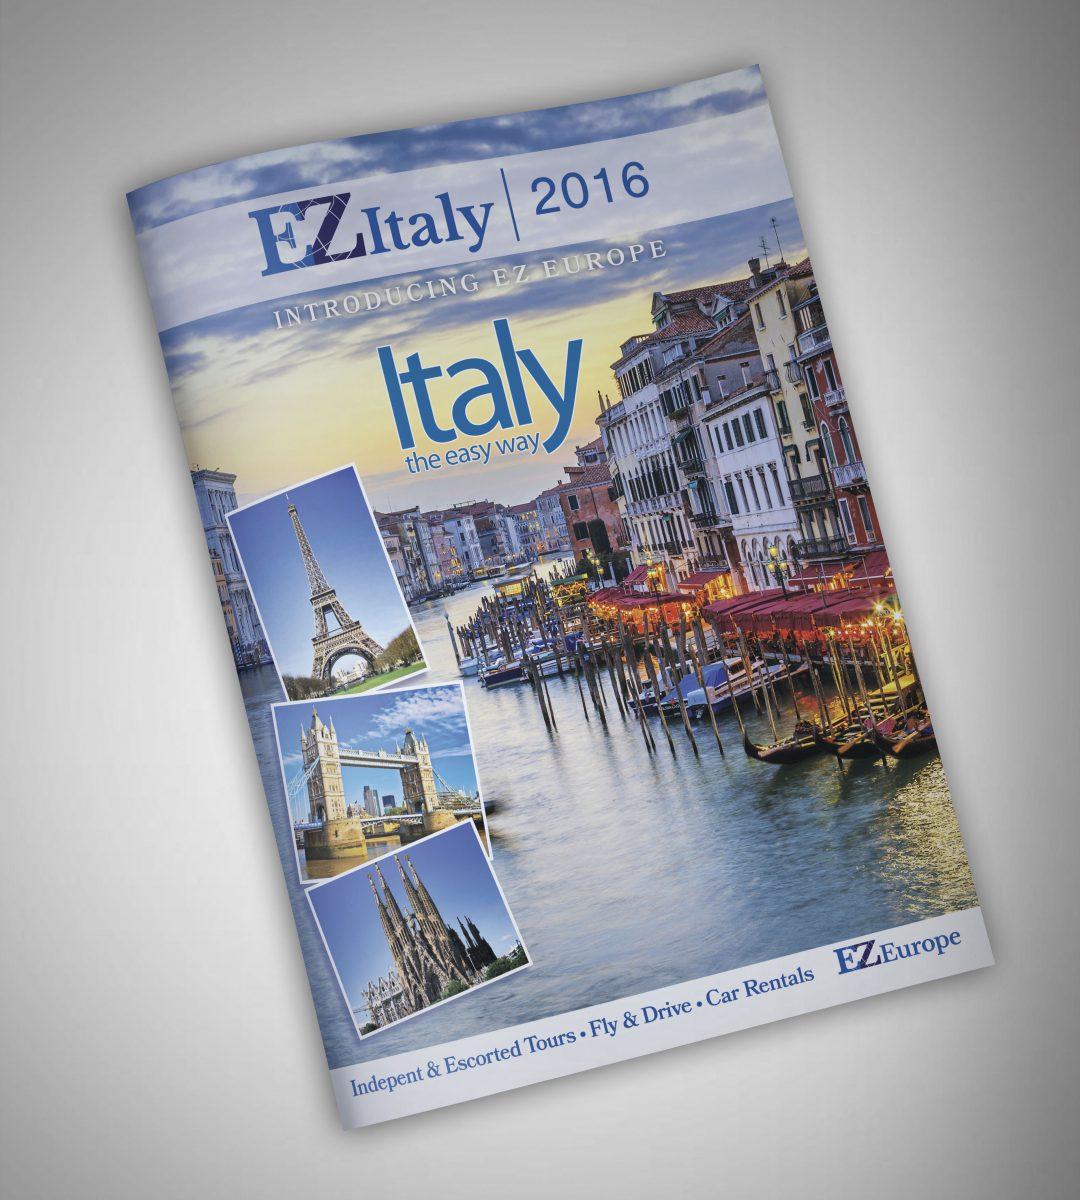 EZ Italy Catalog